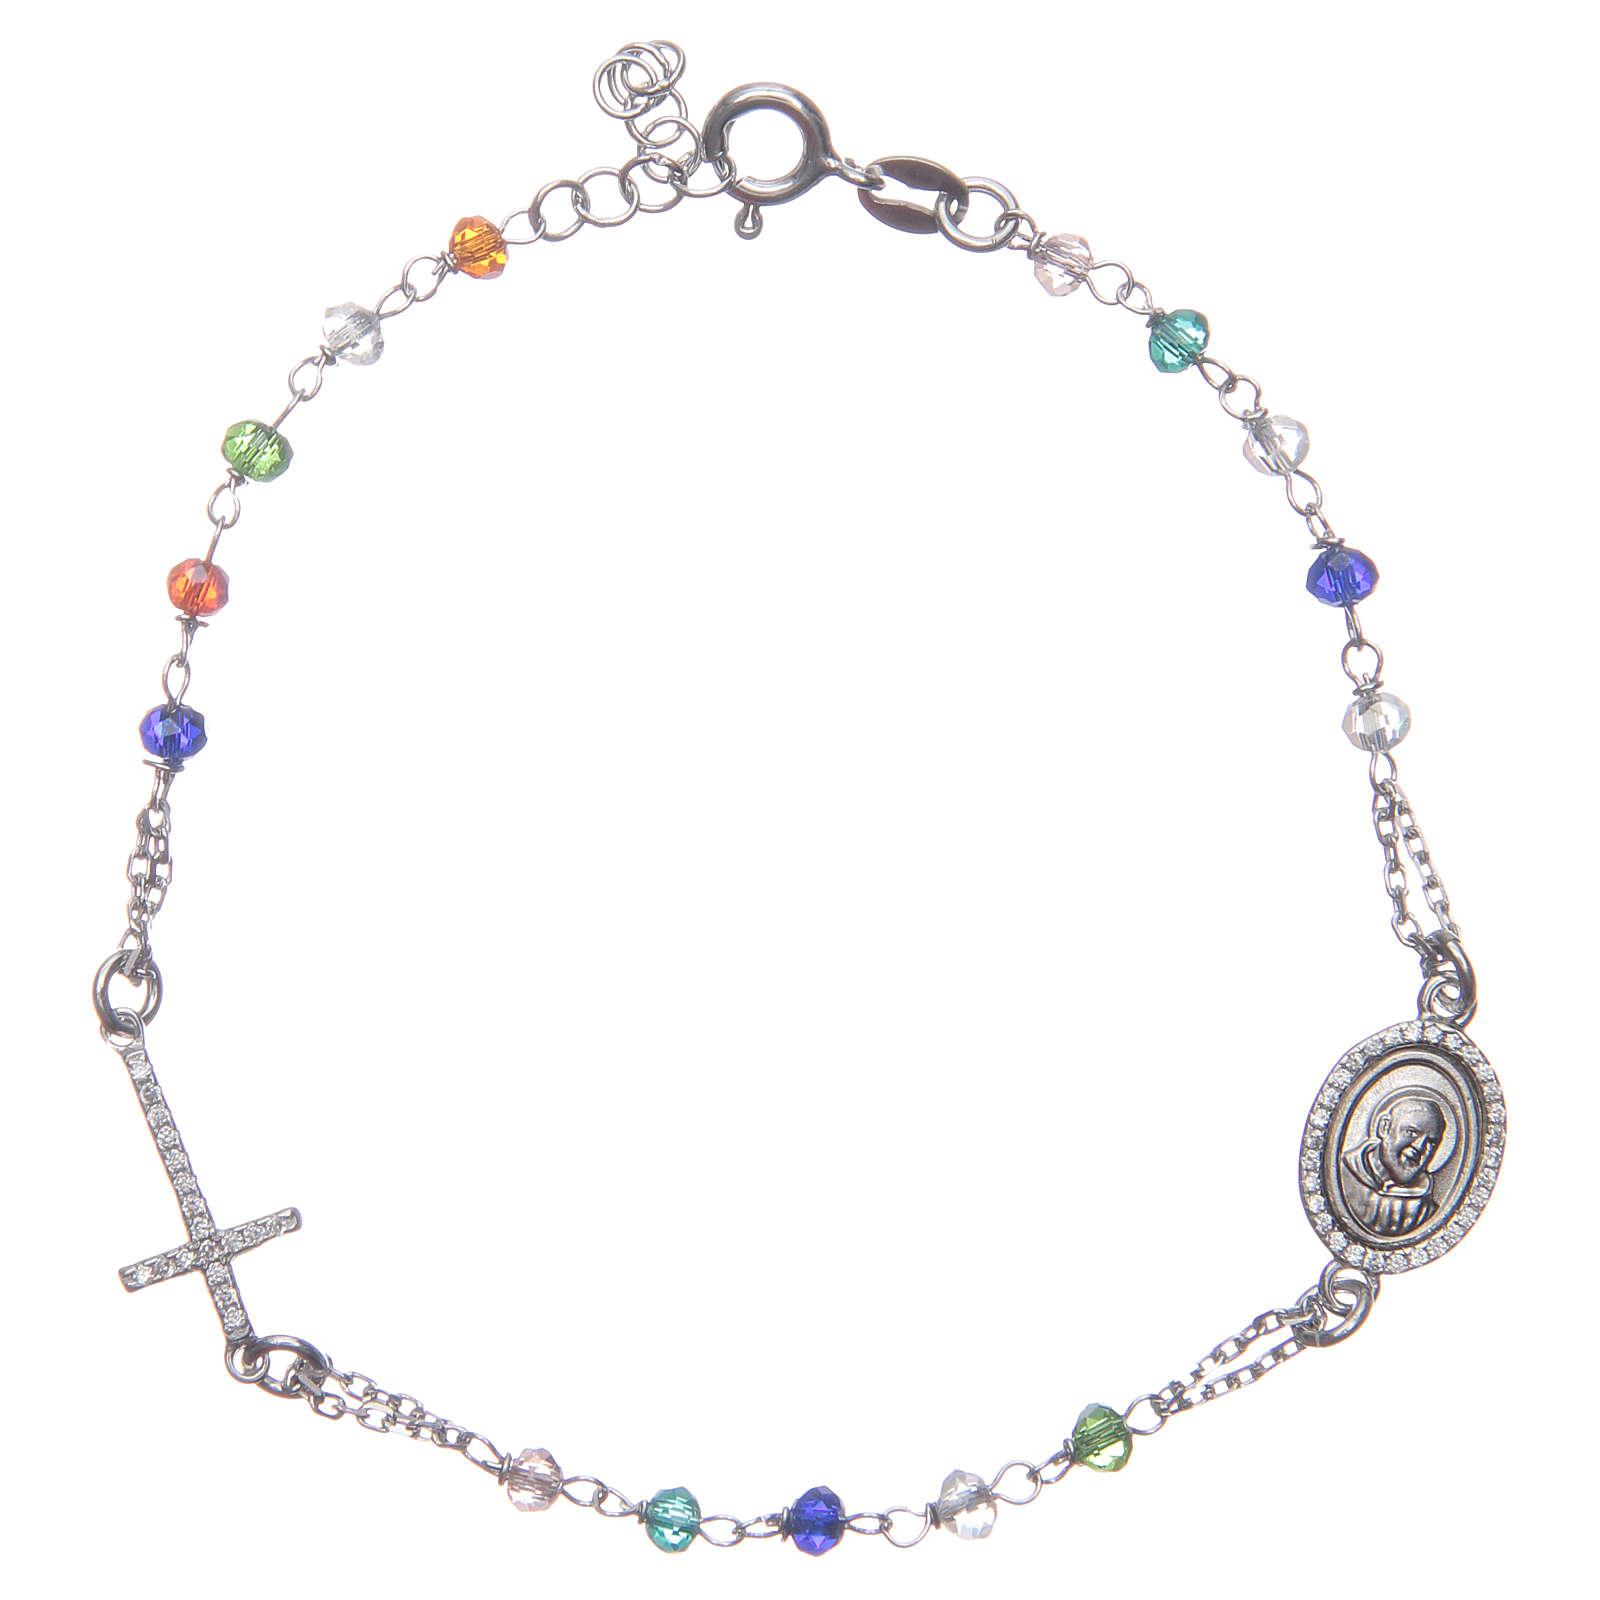 Bracciale rosario Padre Pio multicolor zirconi bianchi argento 925 4